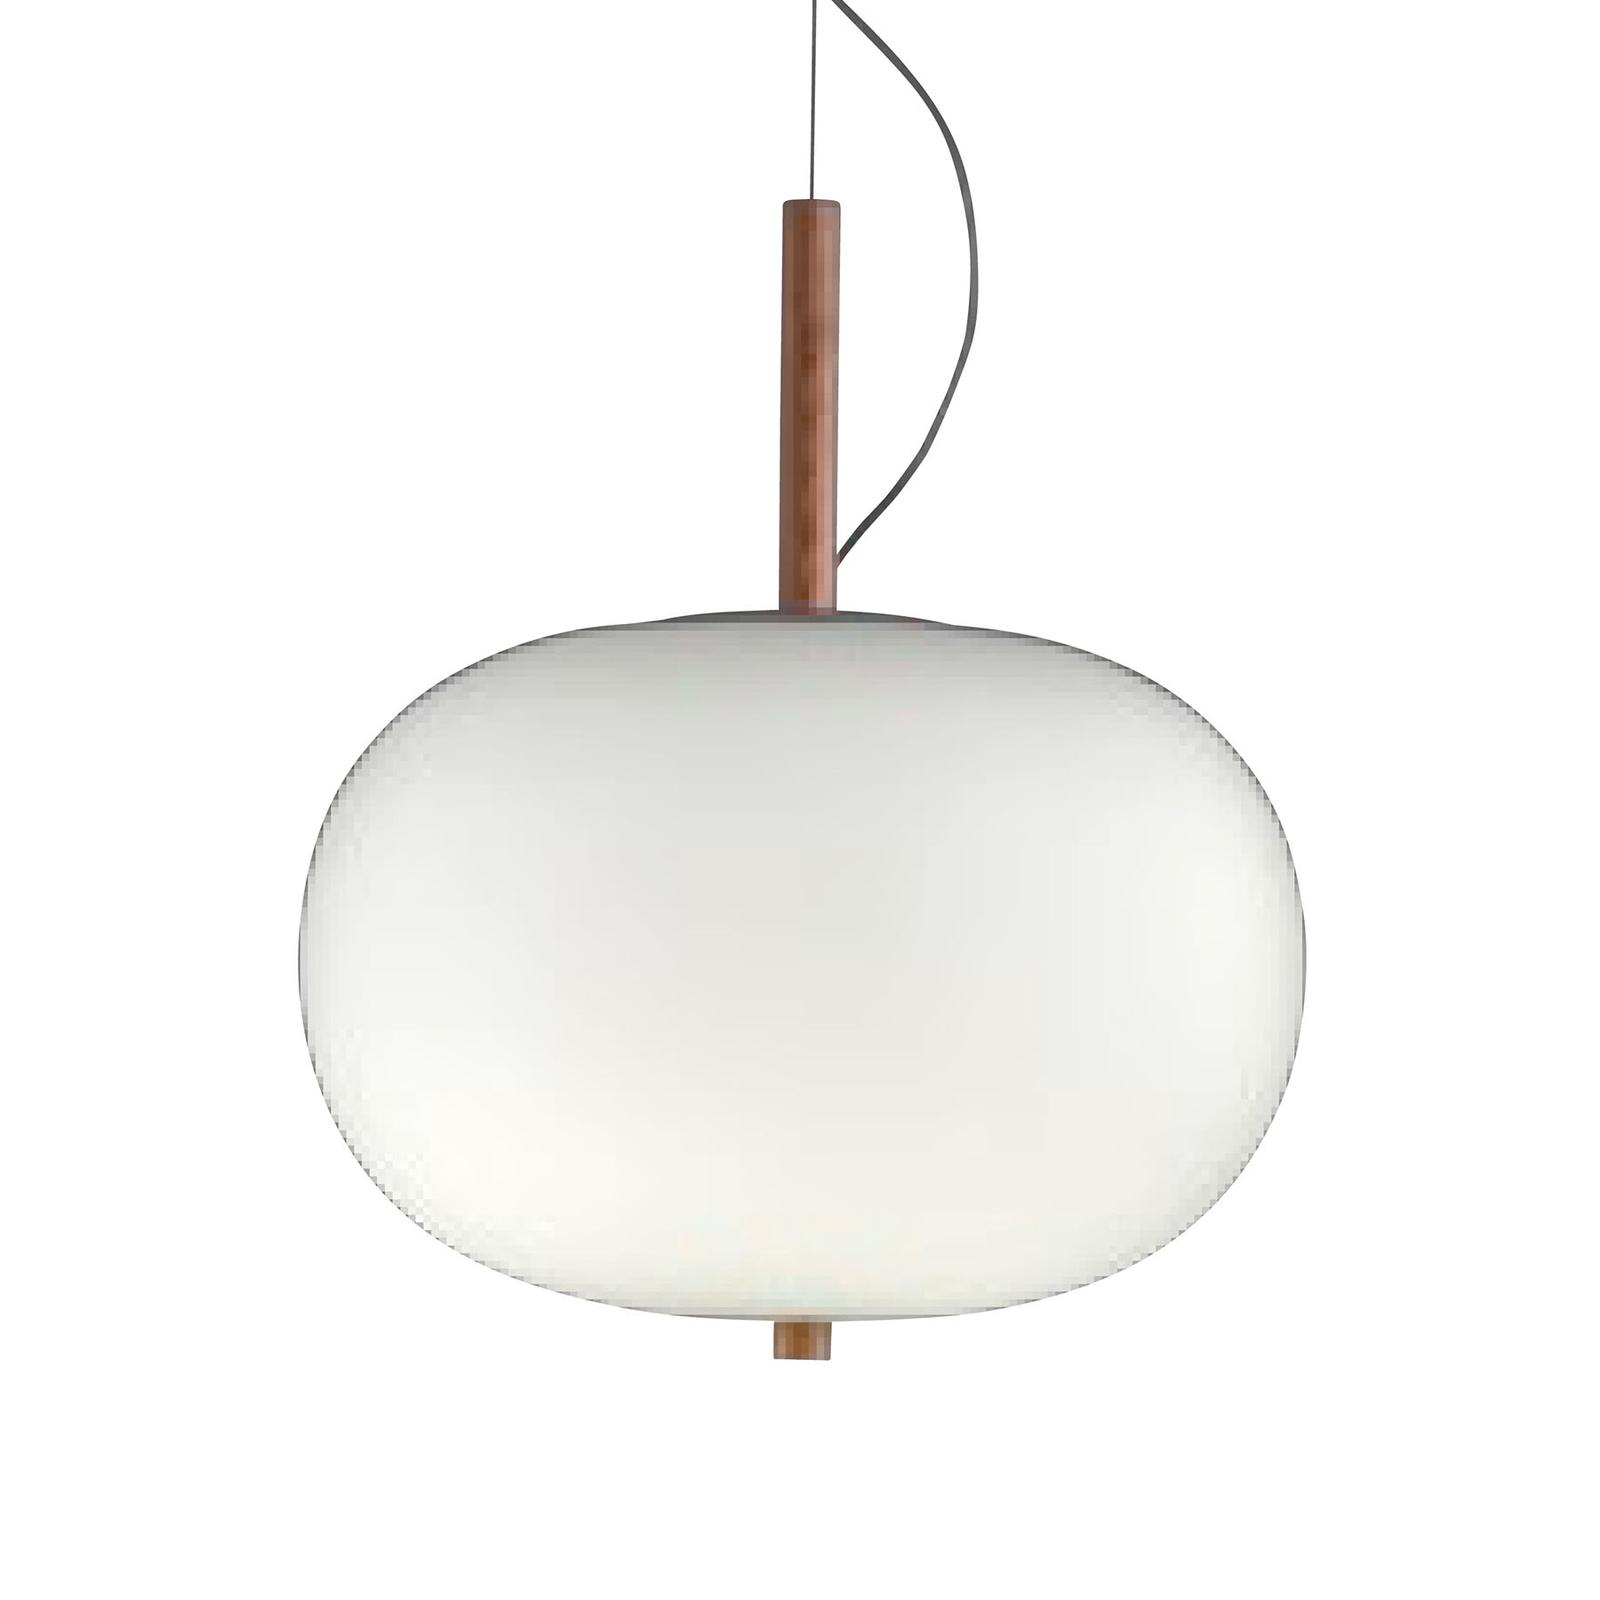 Grok Ilargi Phase LED-pendellampe, lys, Ø 32 cm